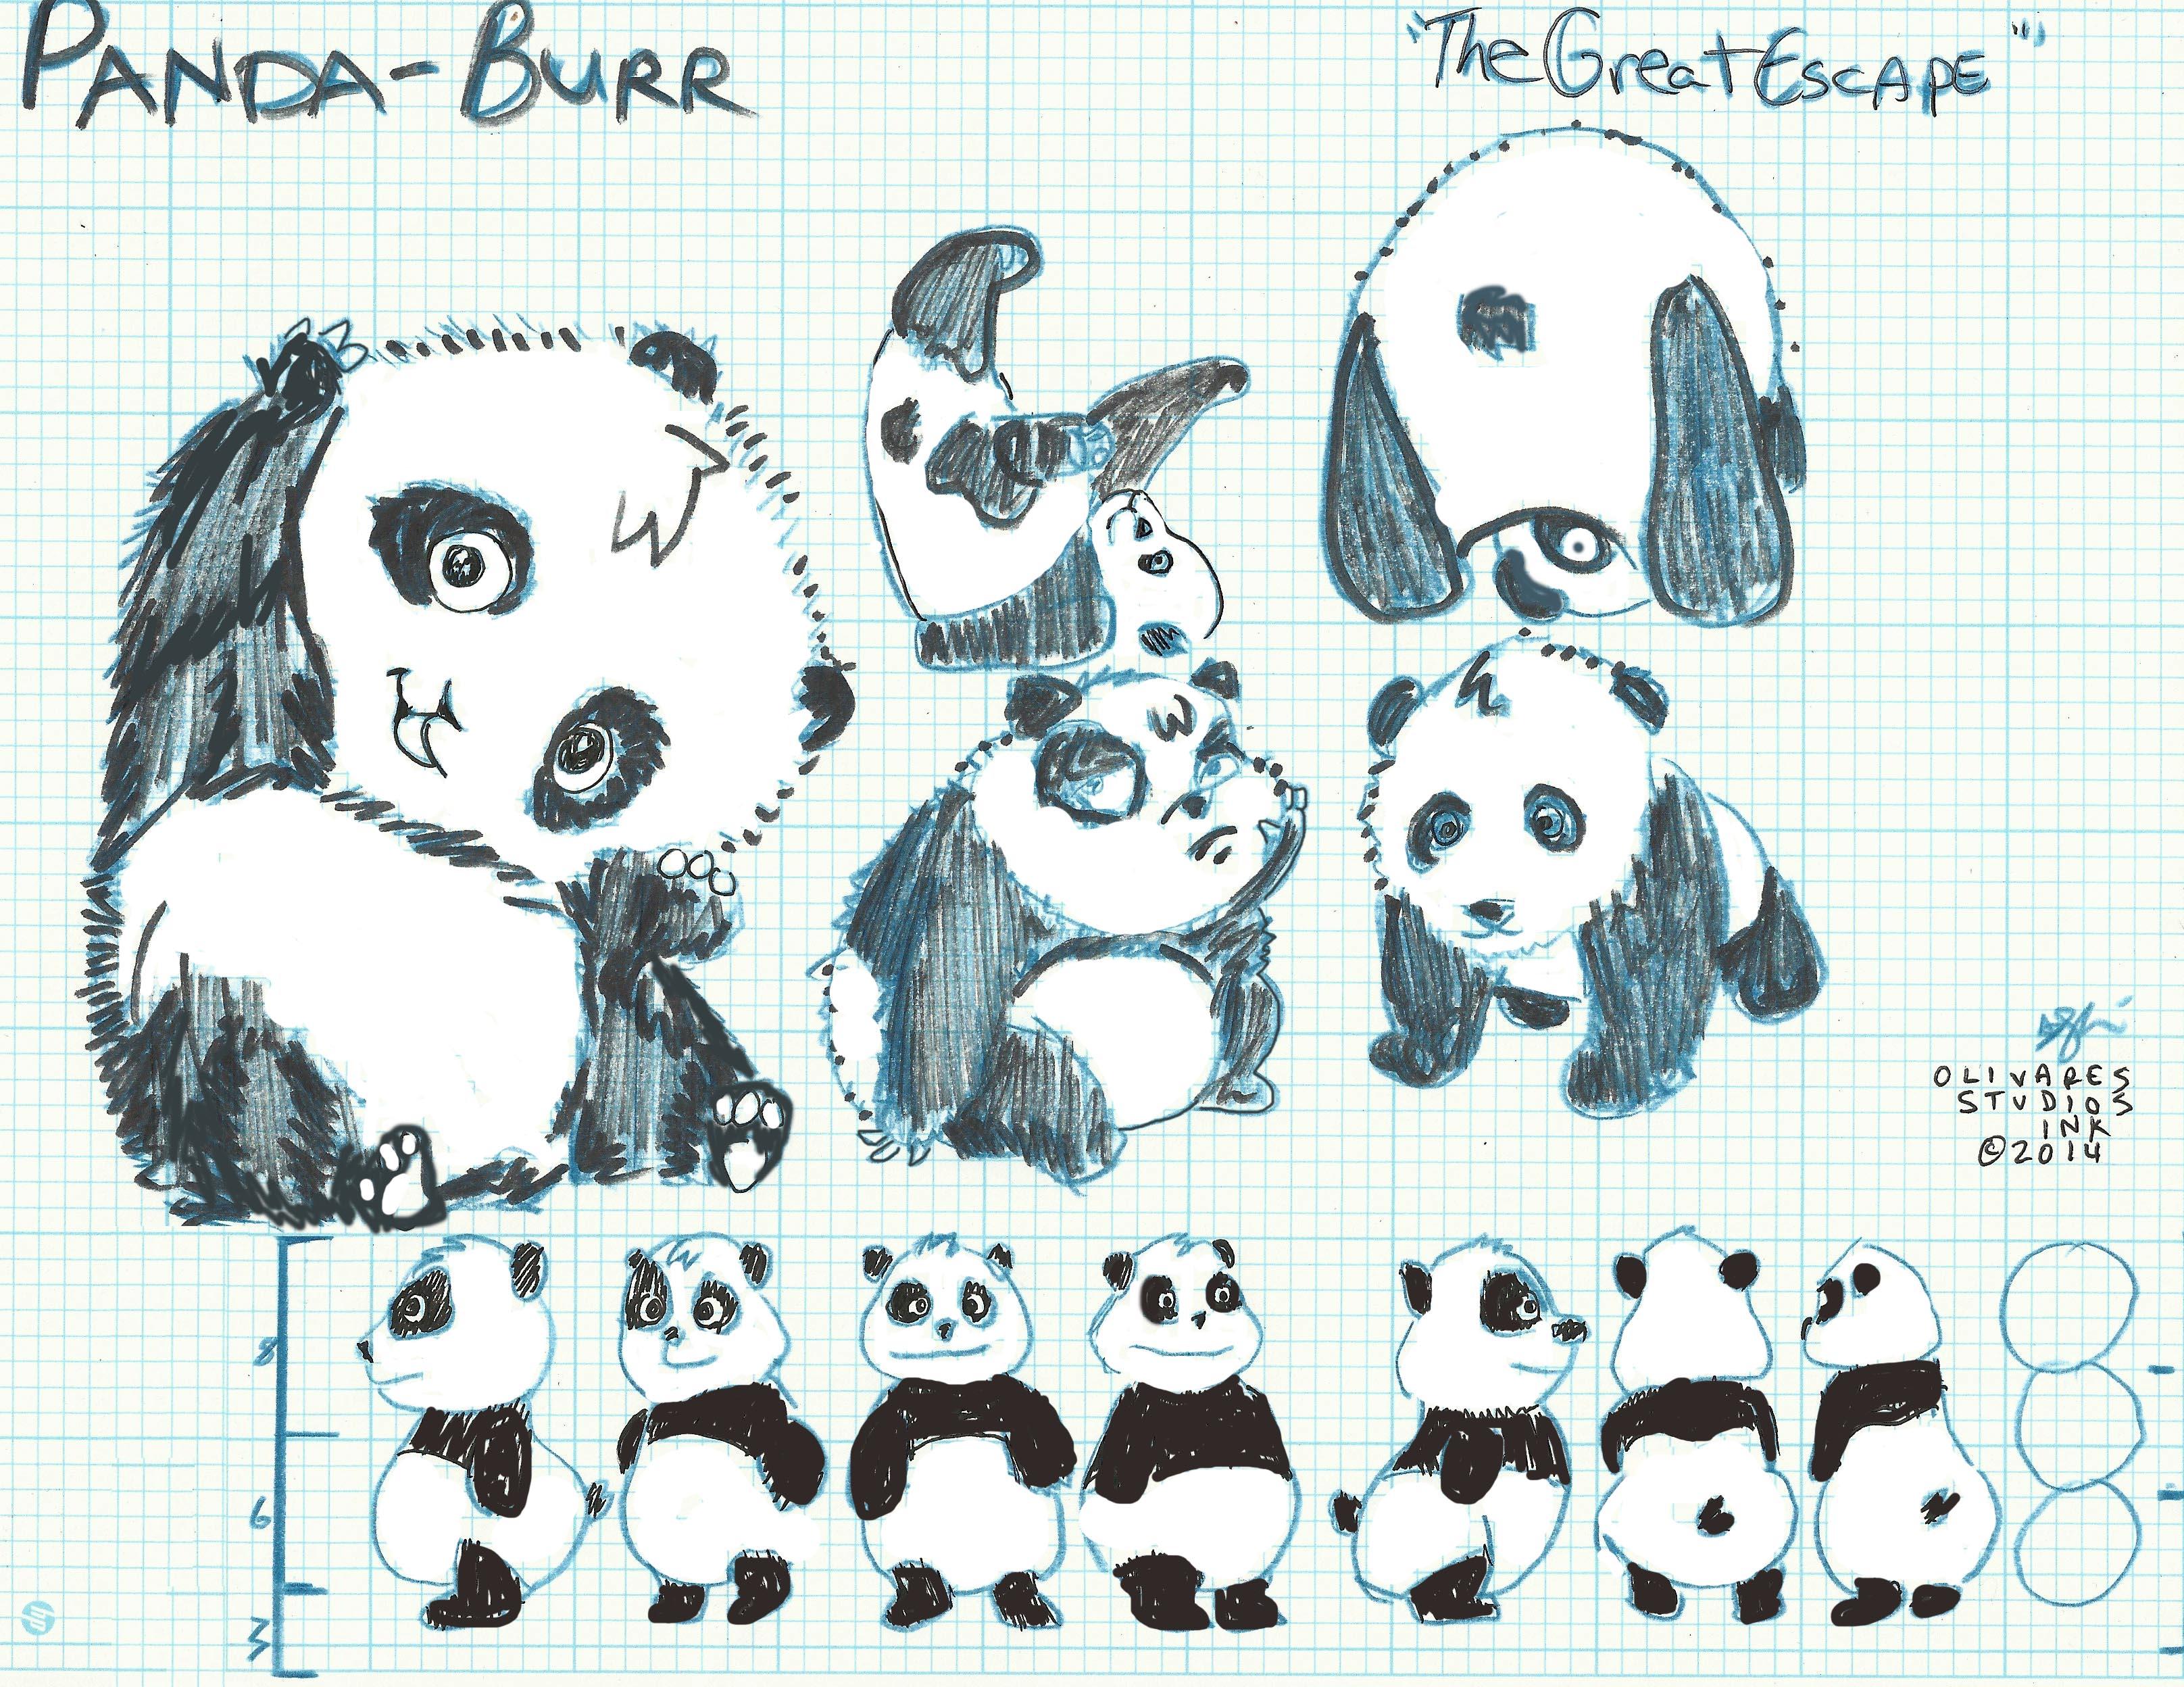 Panda Burr